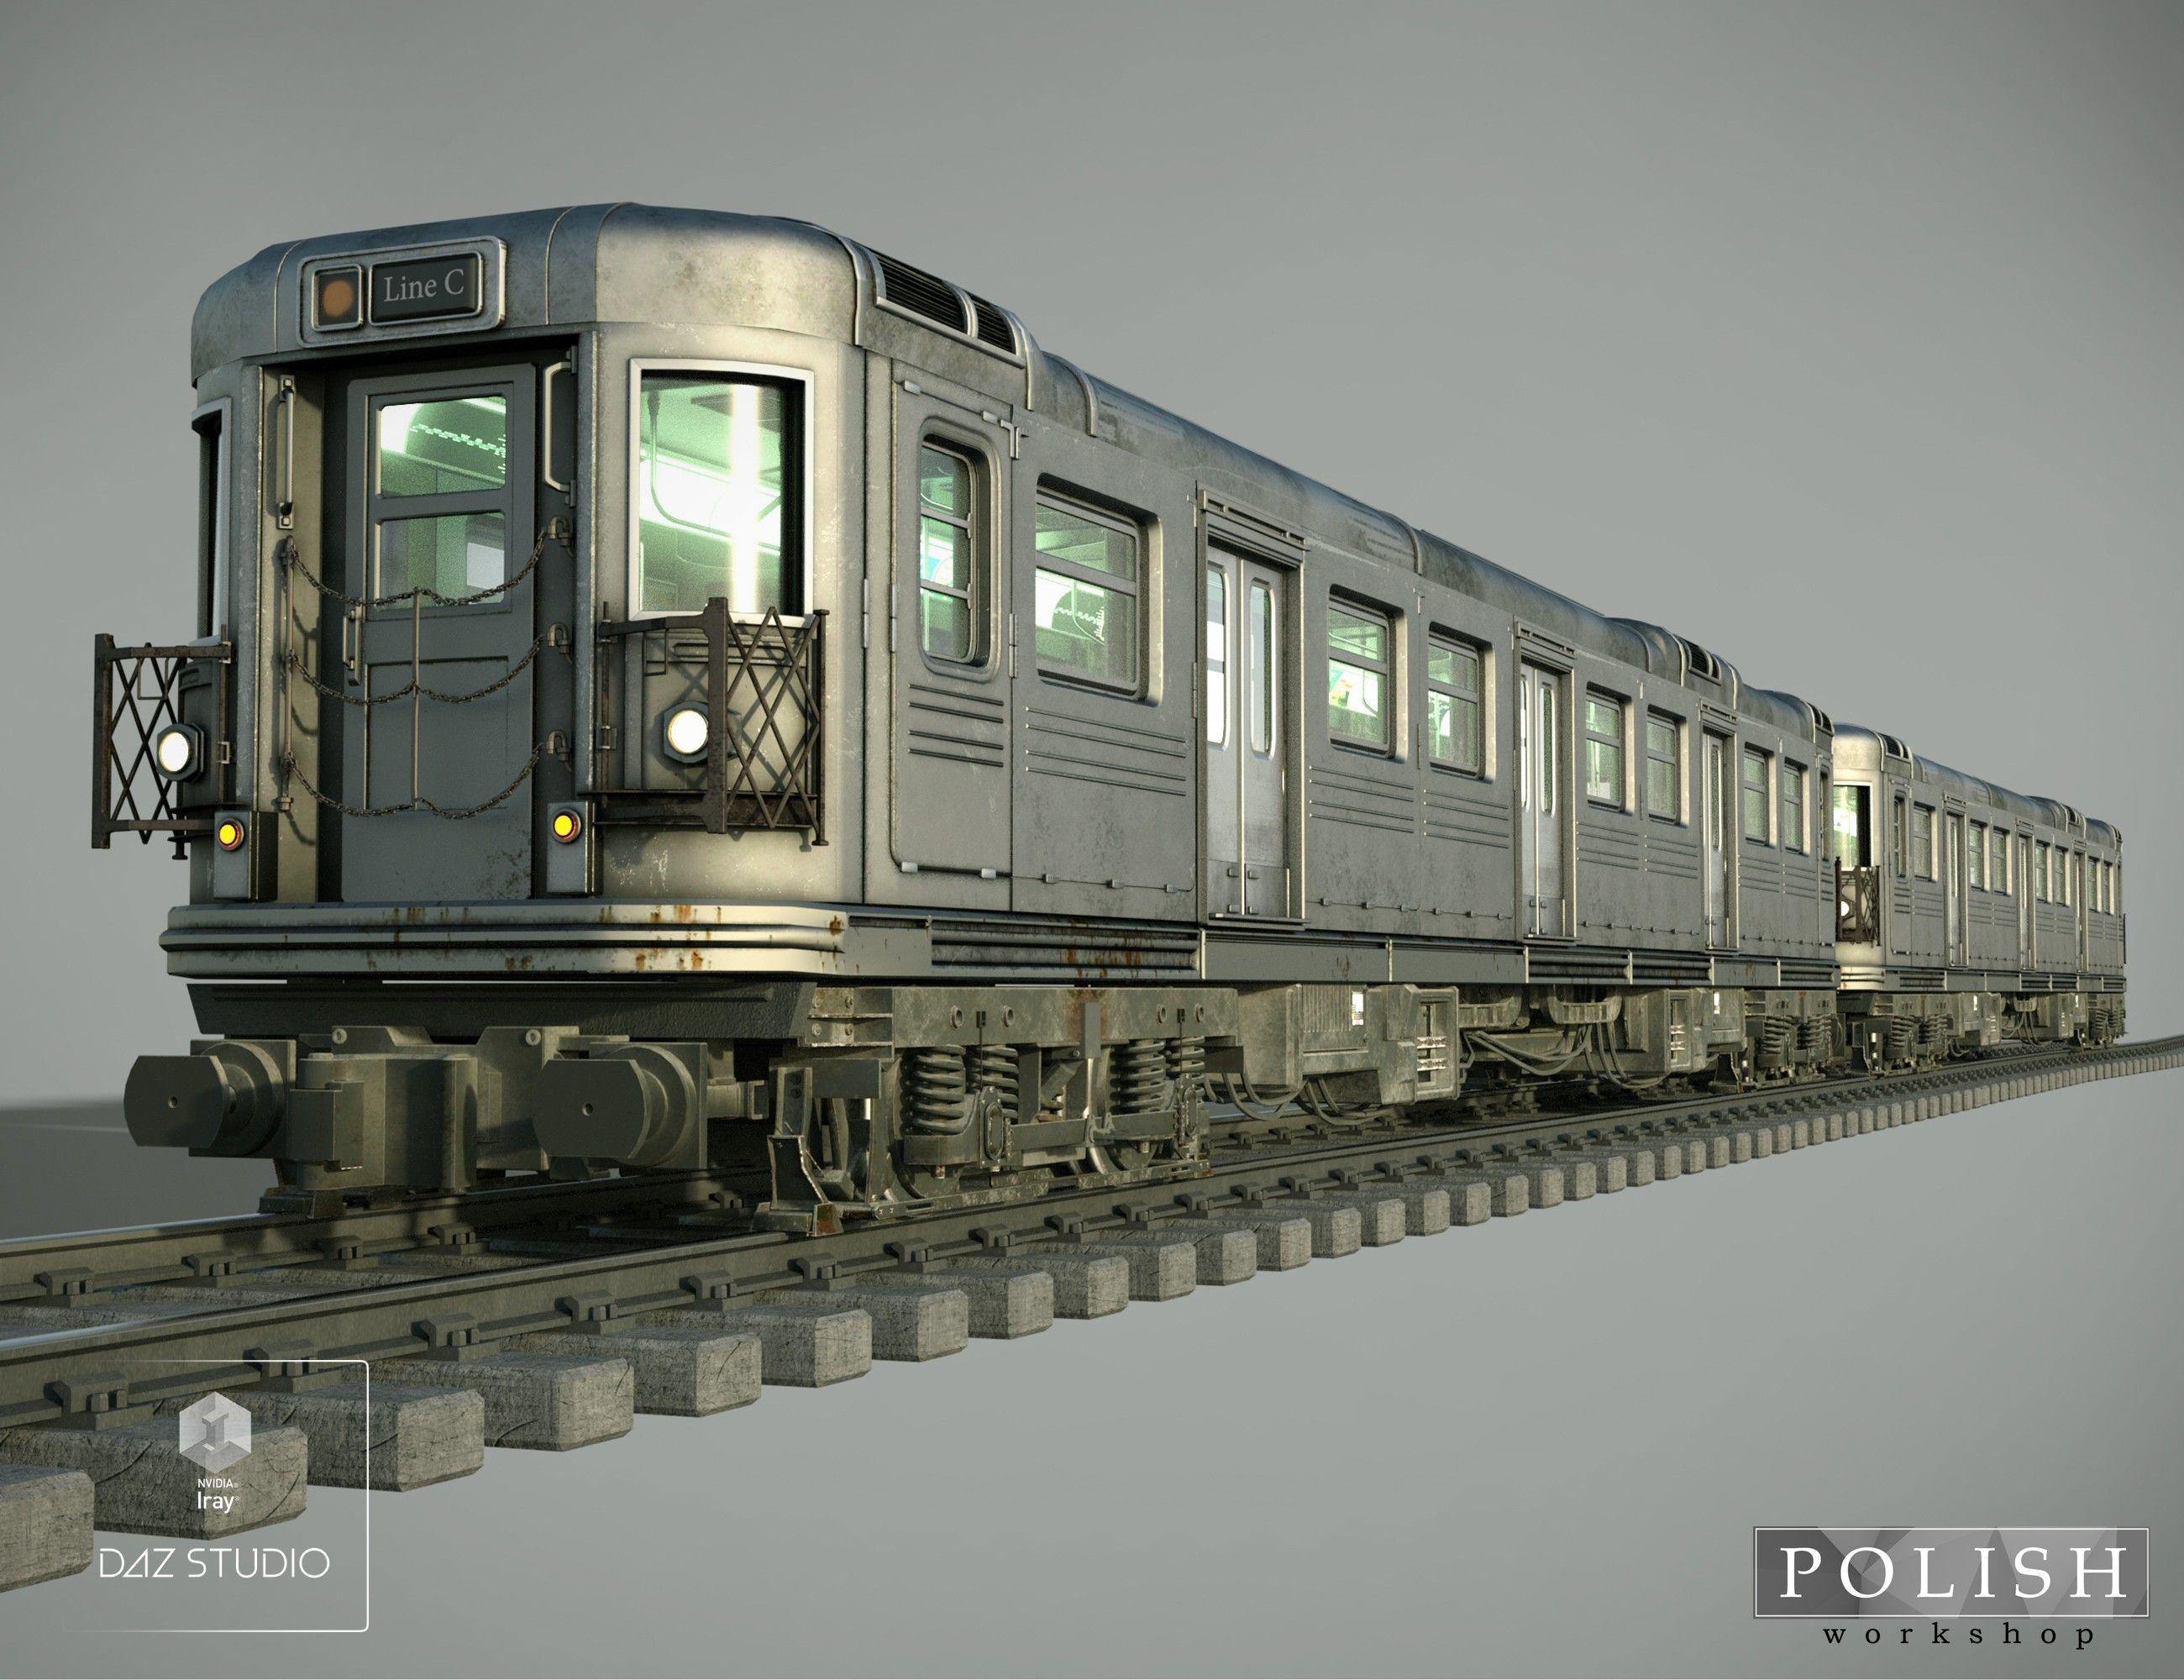 Outdoor Küche Edelstahl Metro : Subway train 3d models and 3d software by daz 3d metro pinterest